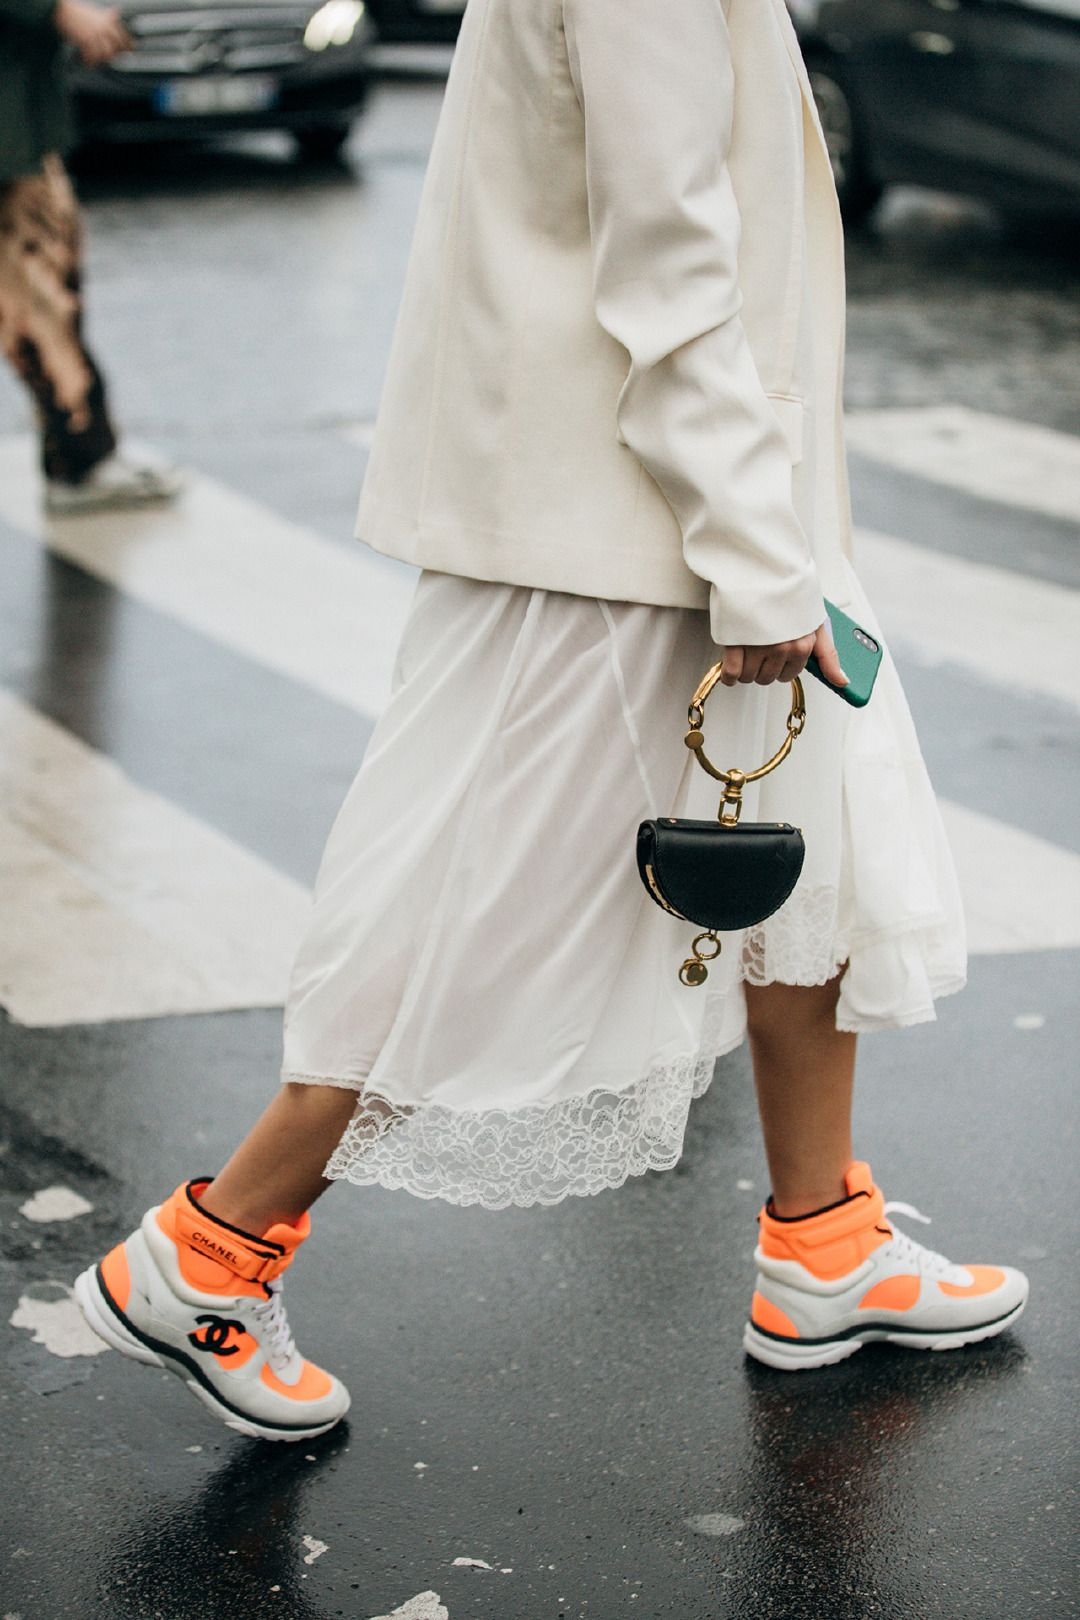 2019 2020 Autumn Winter Paris Fashion Week in 2019 Street style 1080x1620